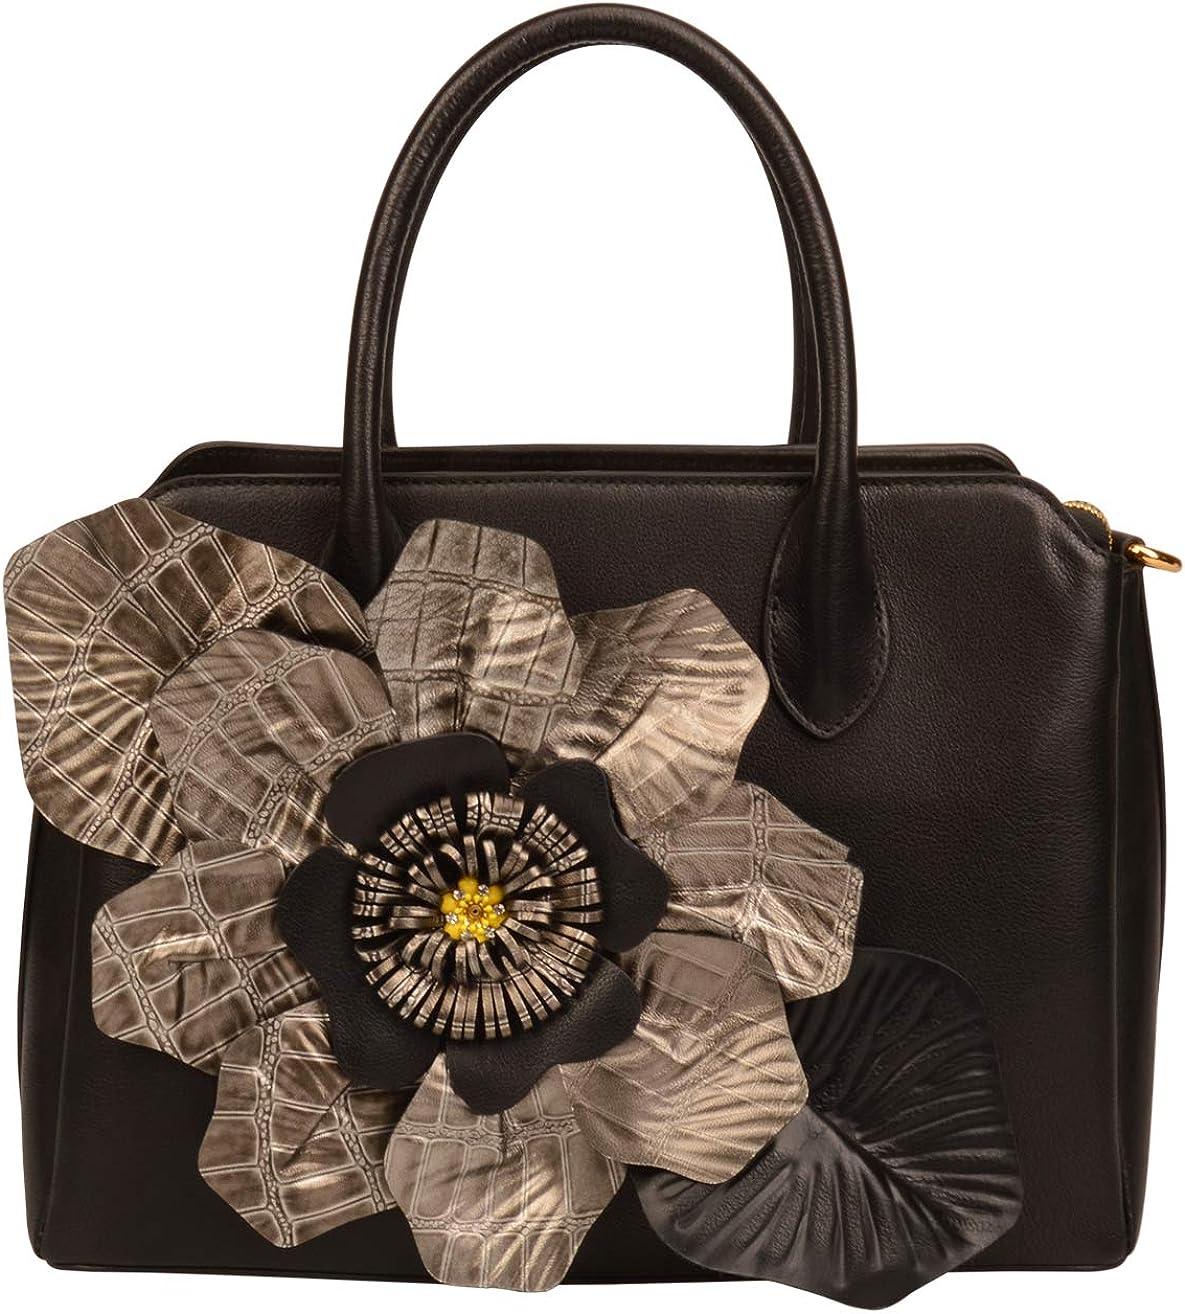 Women's Genuine Leather Flower Top Handle Handbags Designer Purse For Business